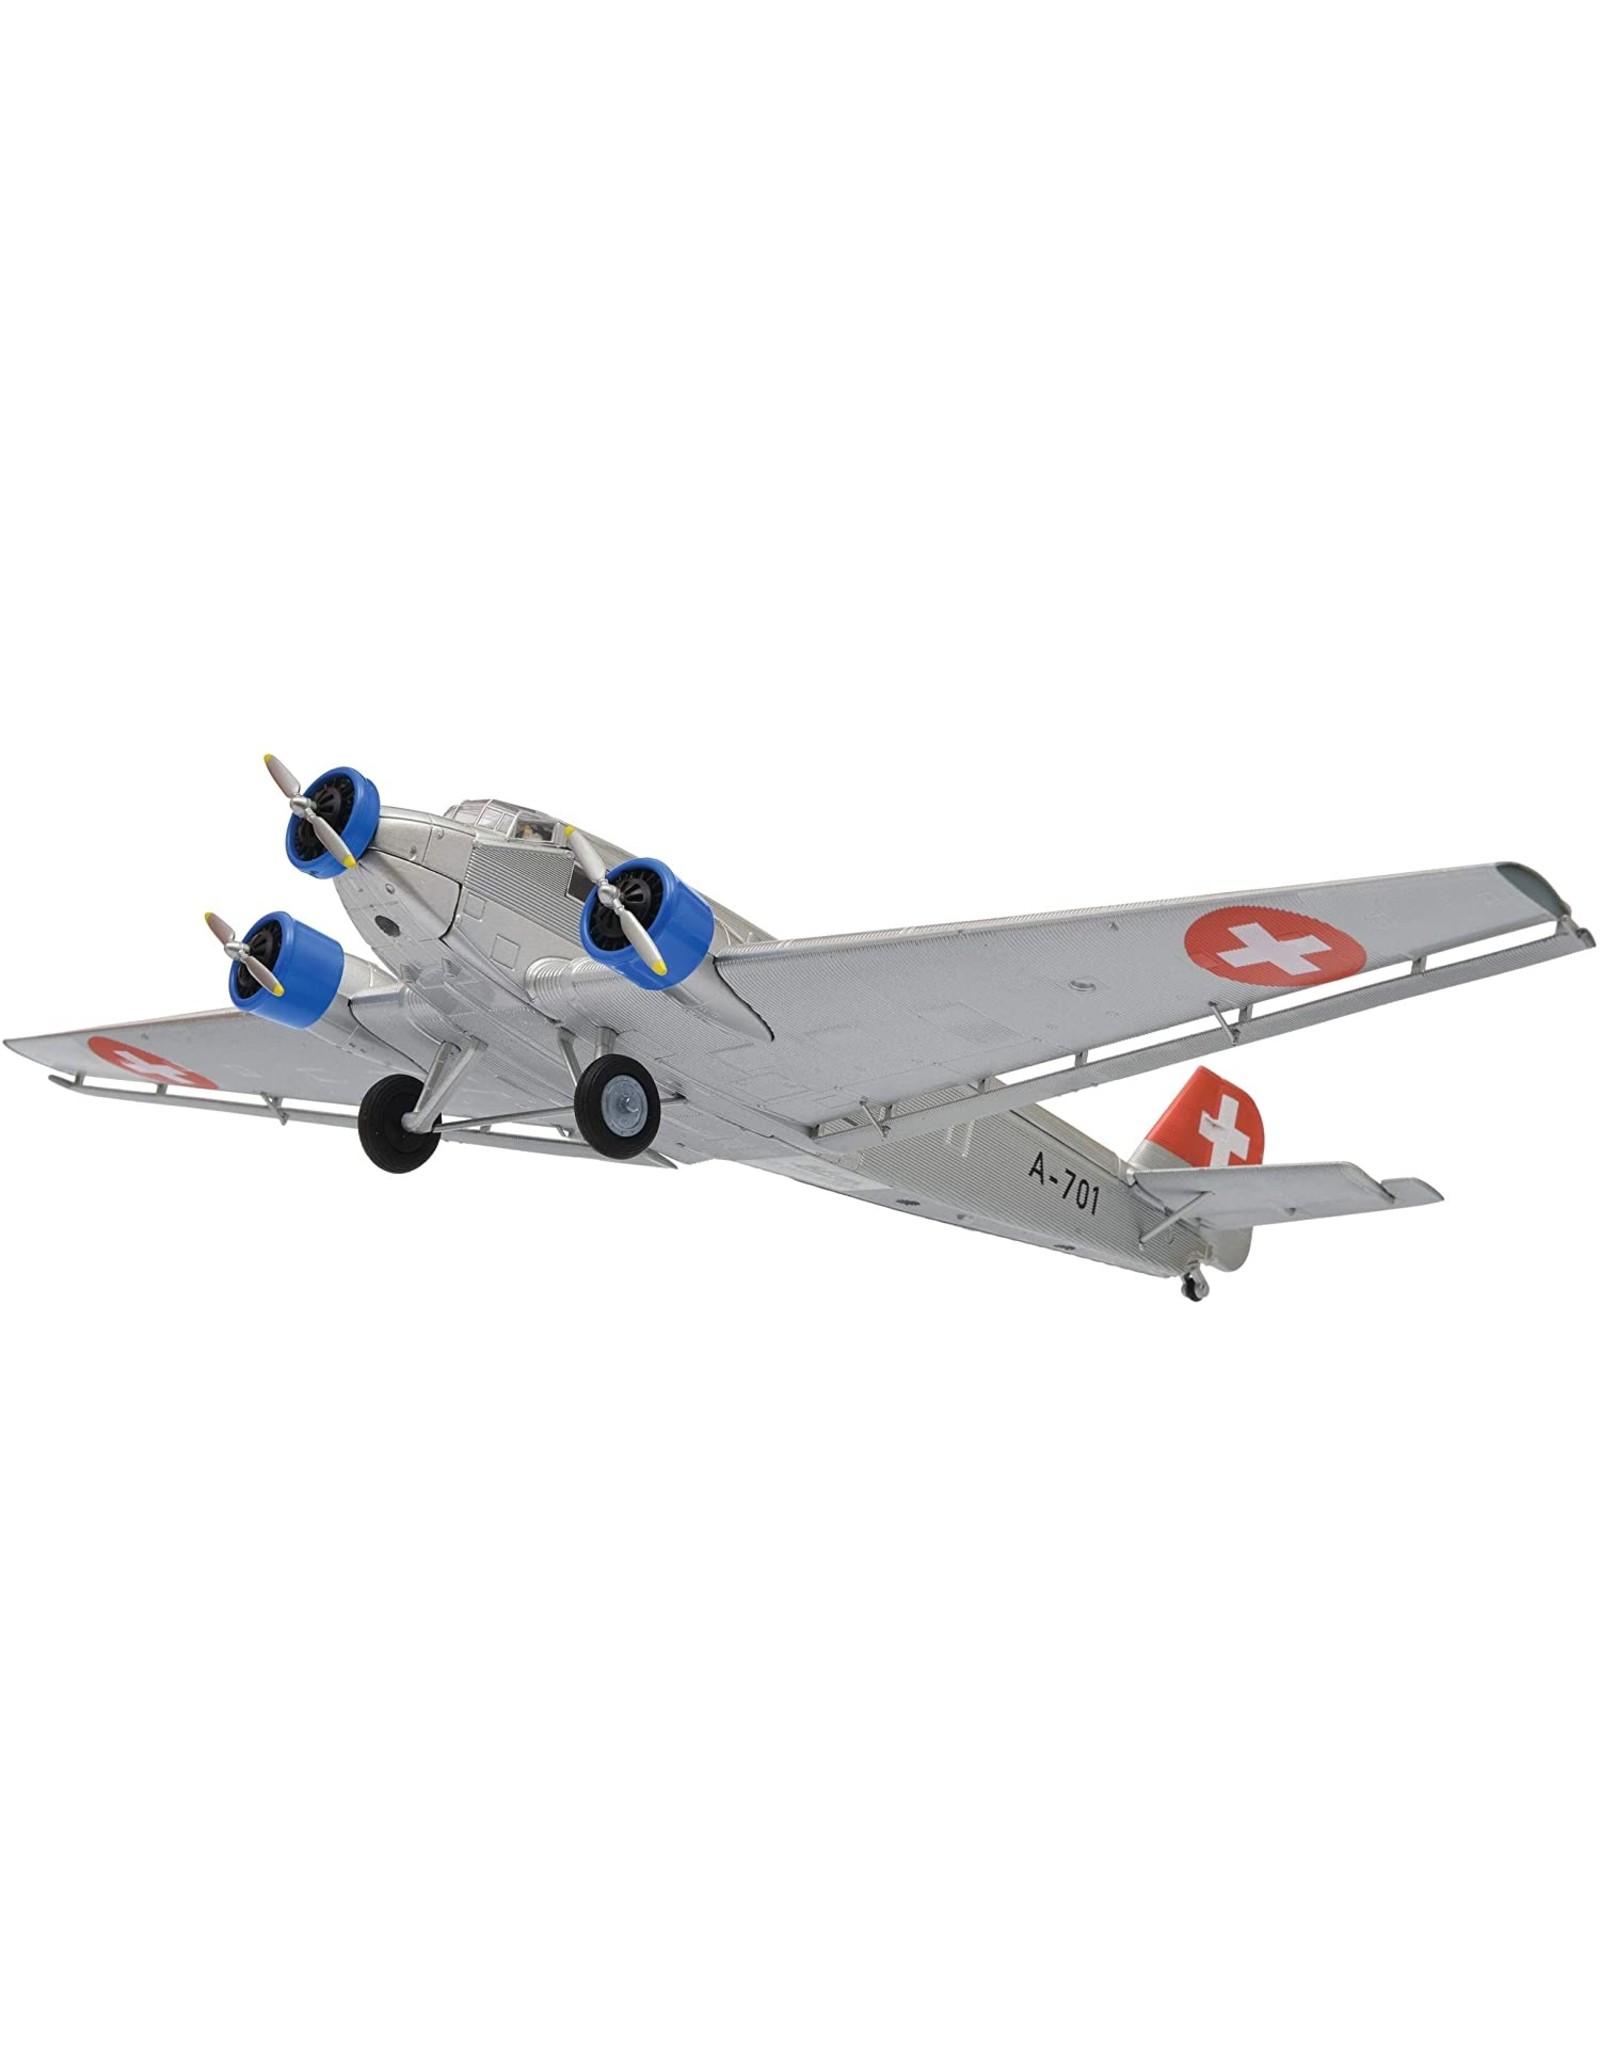 "Junkers Junkers Ju52/3m ""Schweizer Luftwaffe"" - 1:72 - Schuco"